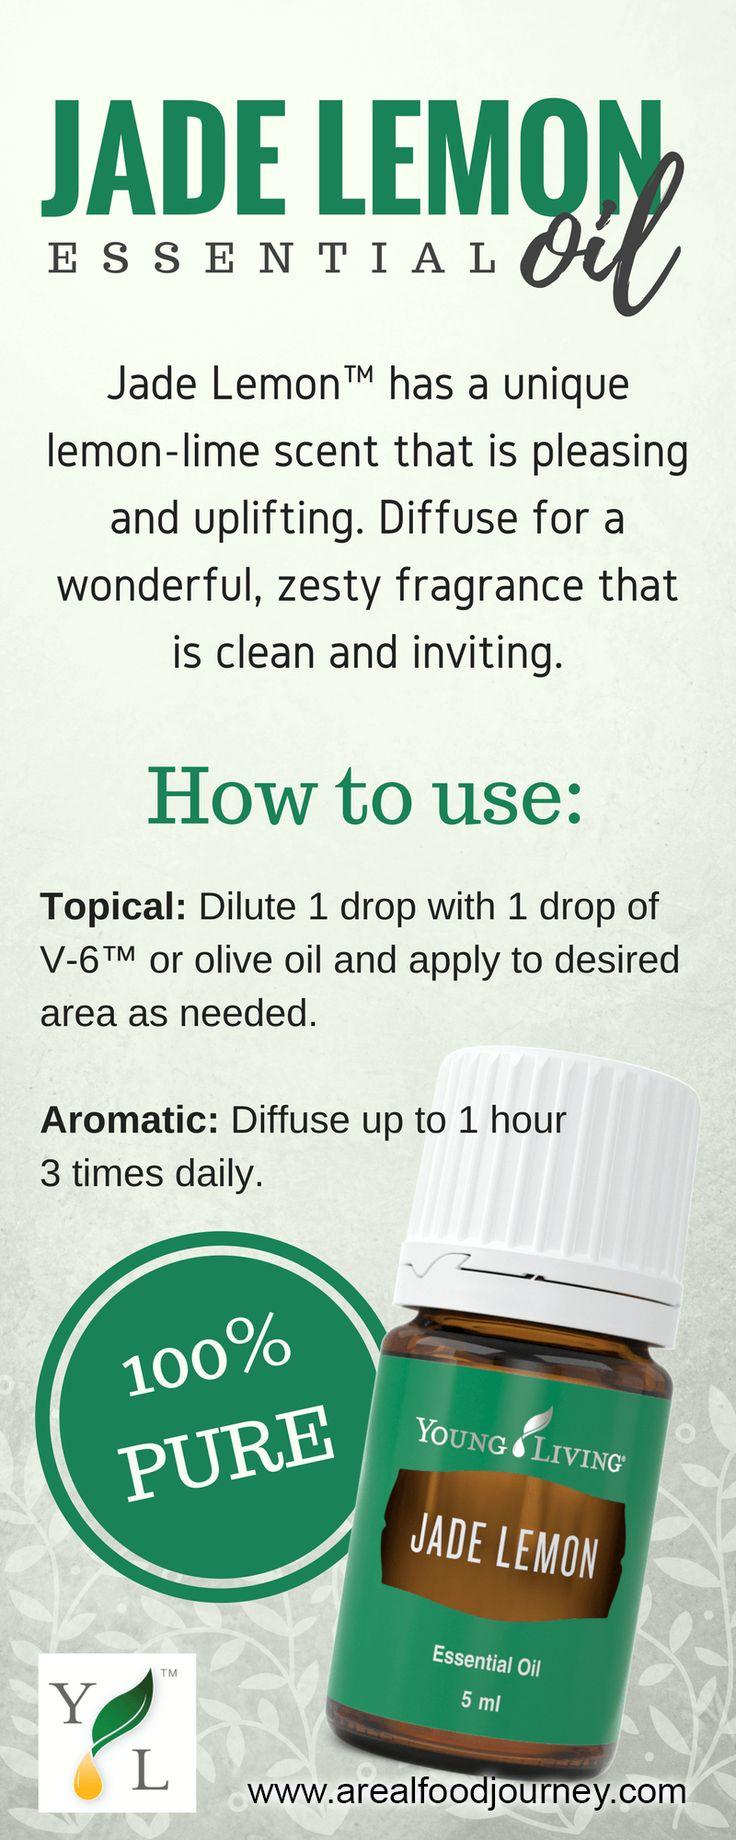 jade lemon essential oil Mix with Citronella essential oil for a pleasant, citrus-scented insect repellant.